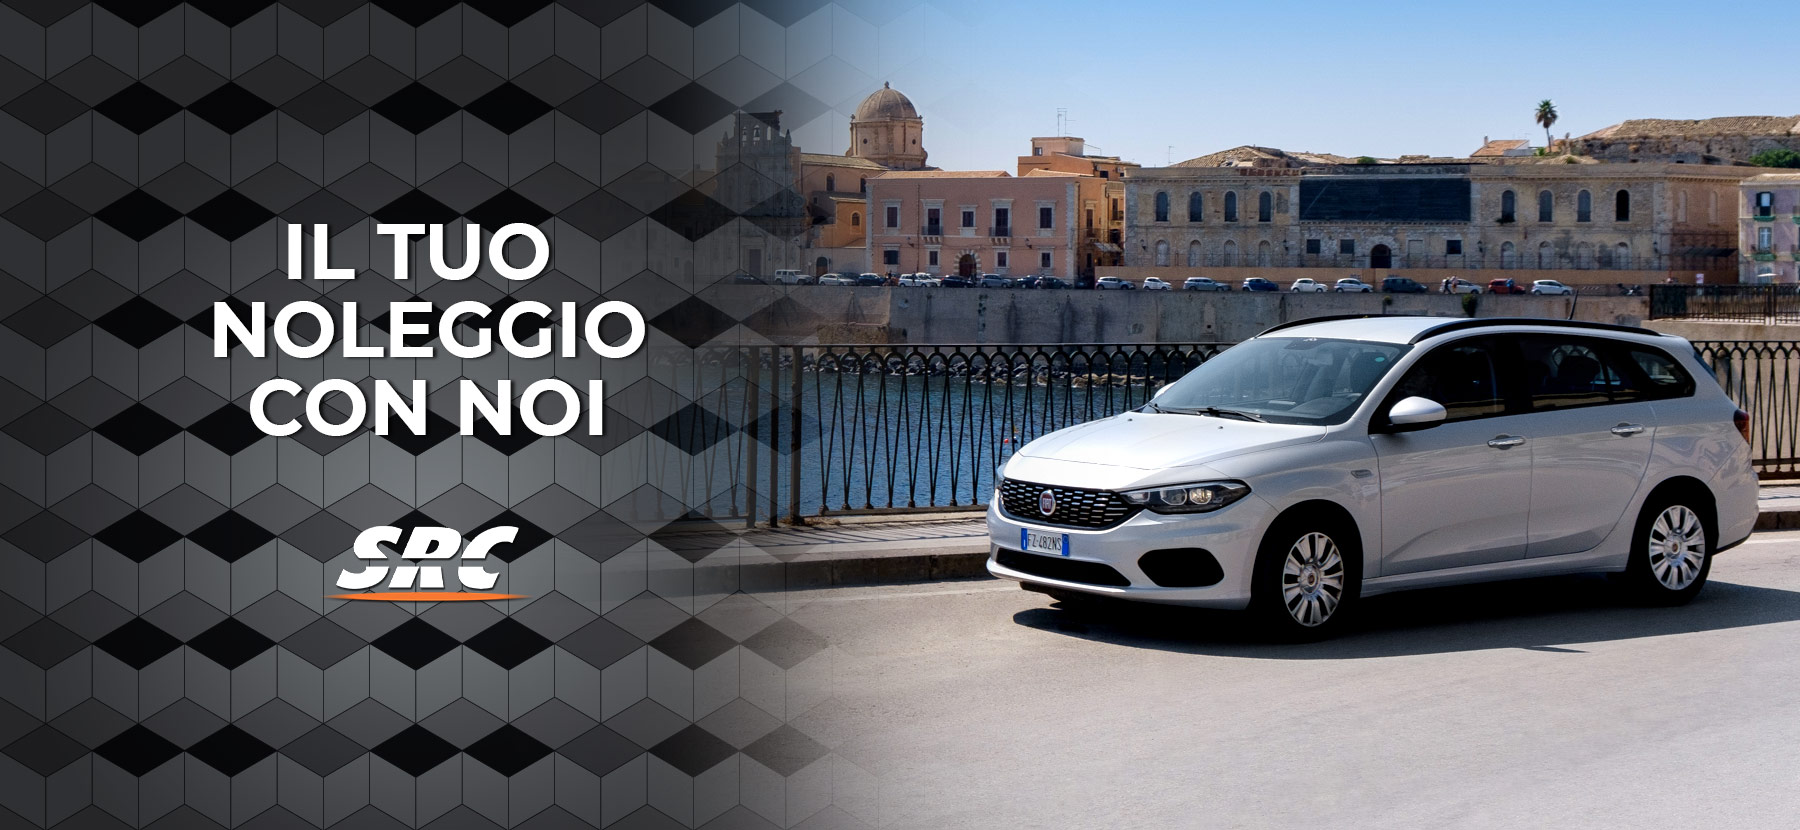 Il tuo noleggio con noi Sicily Rent Car